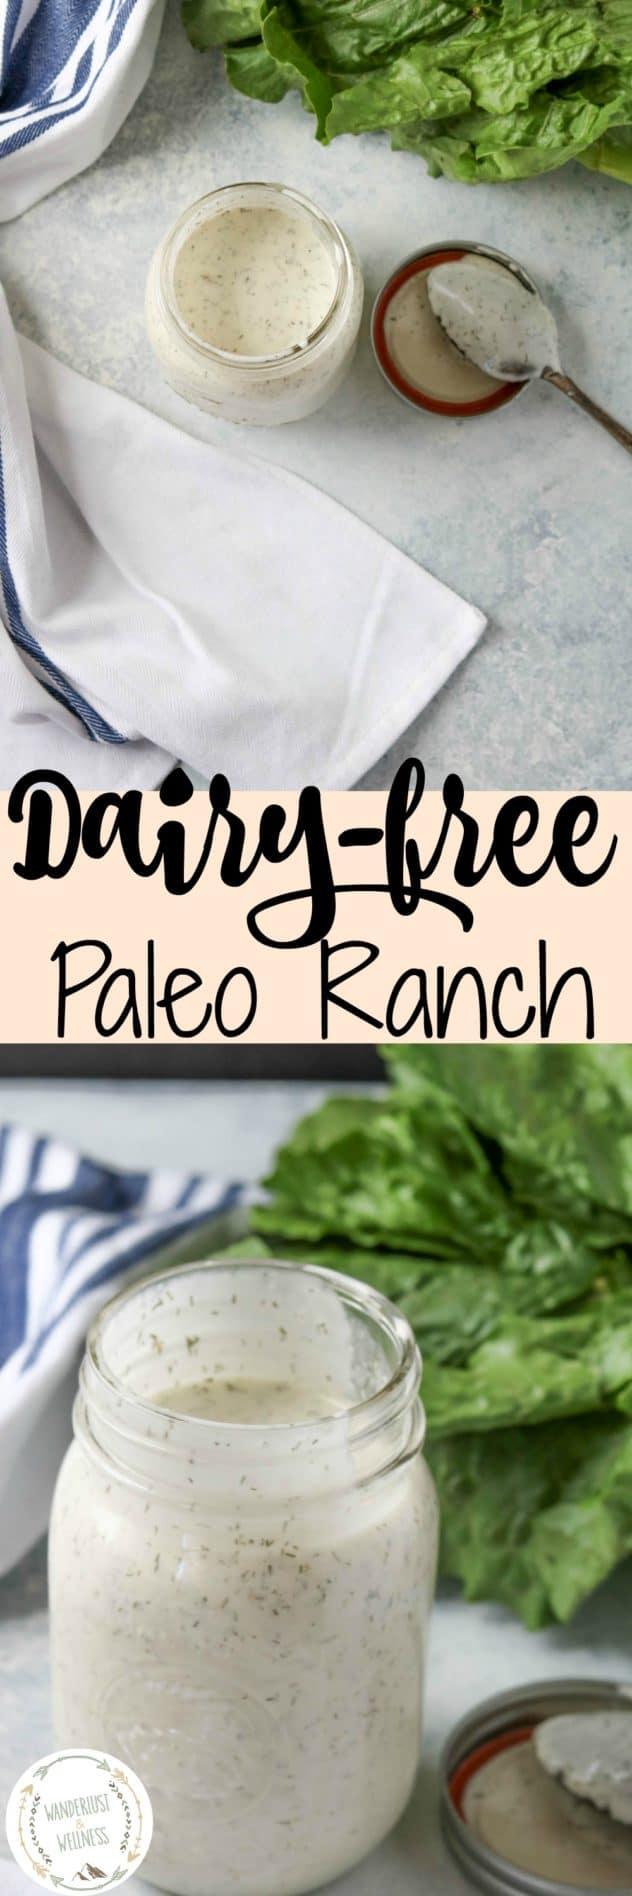 Dairy-Free Paleo Ranch